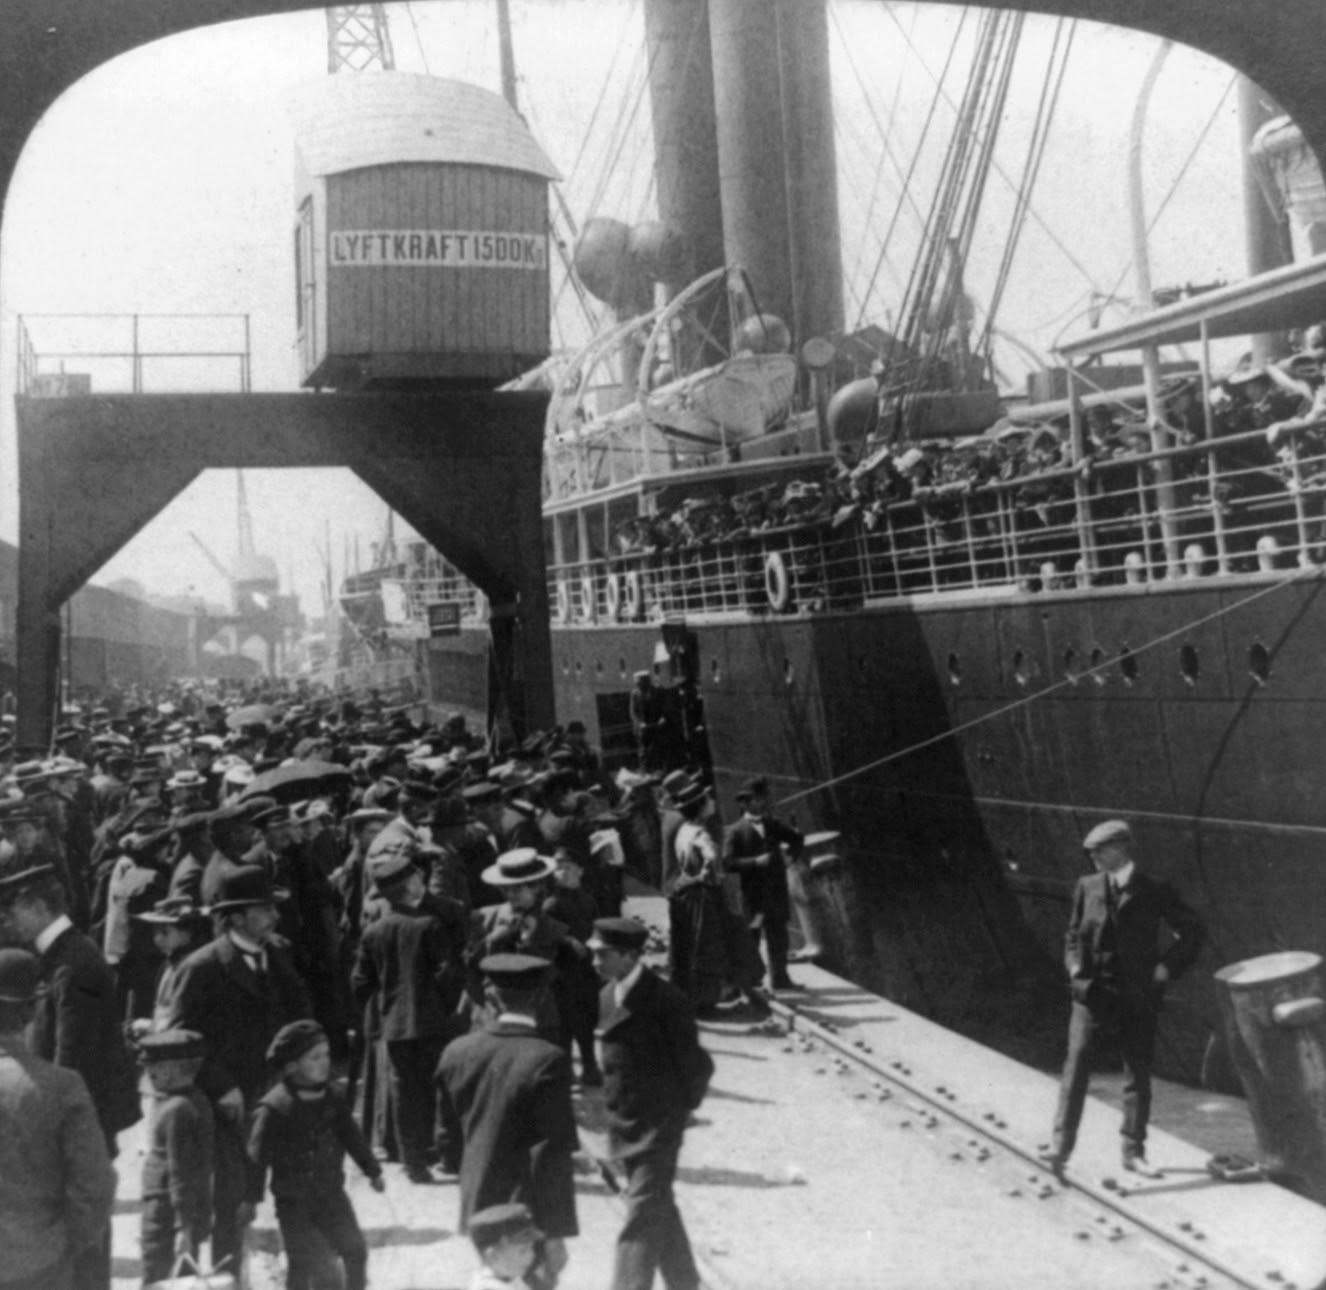 File:Farewell to home, Göteborg, 1905.jpg